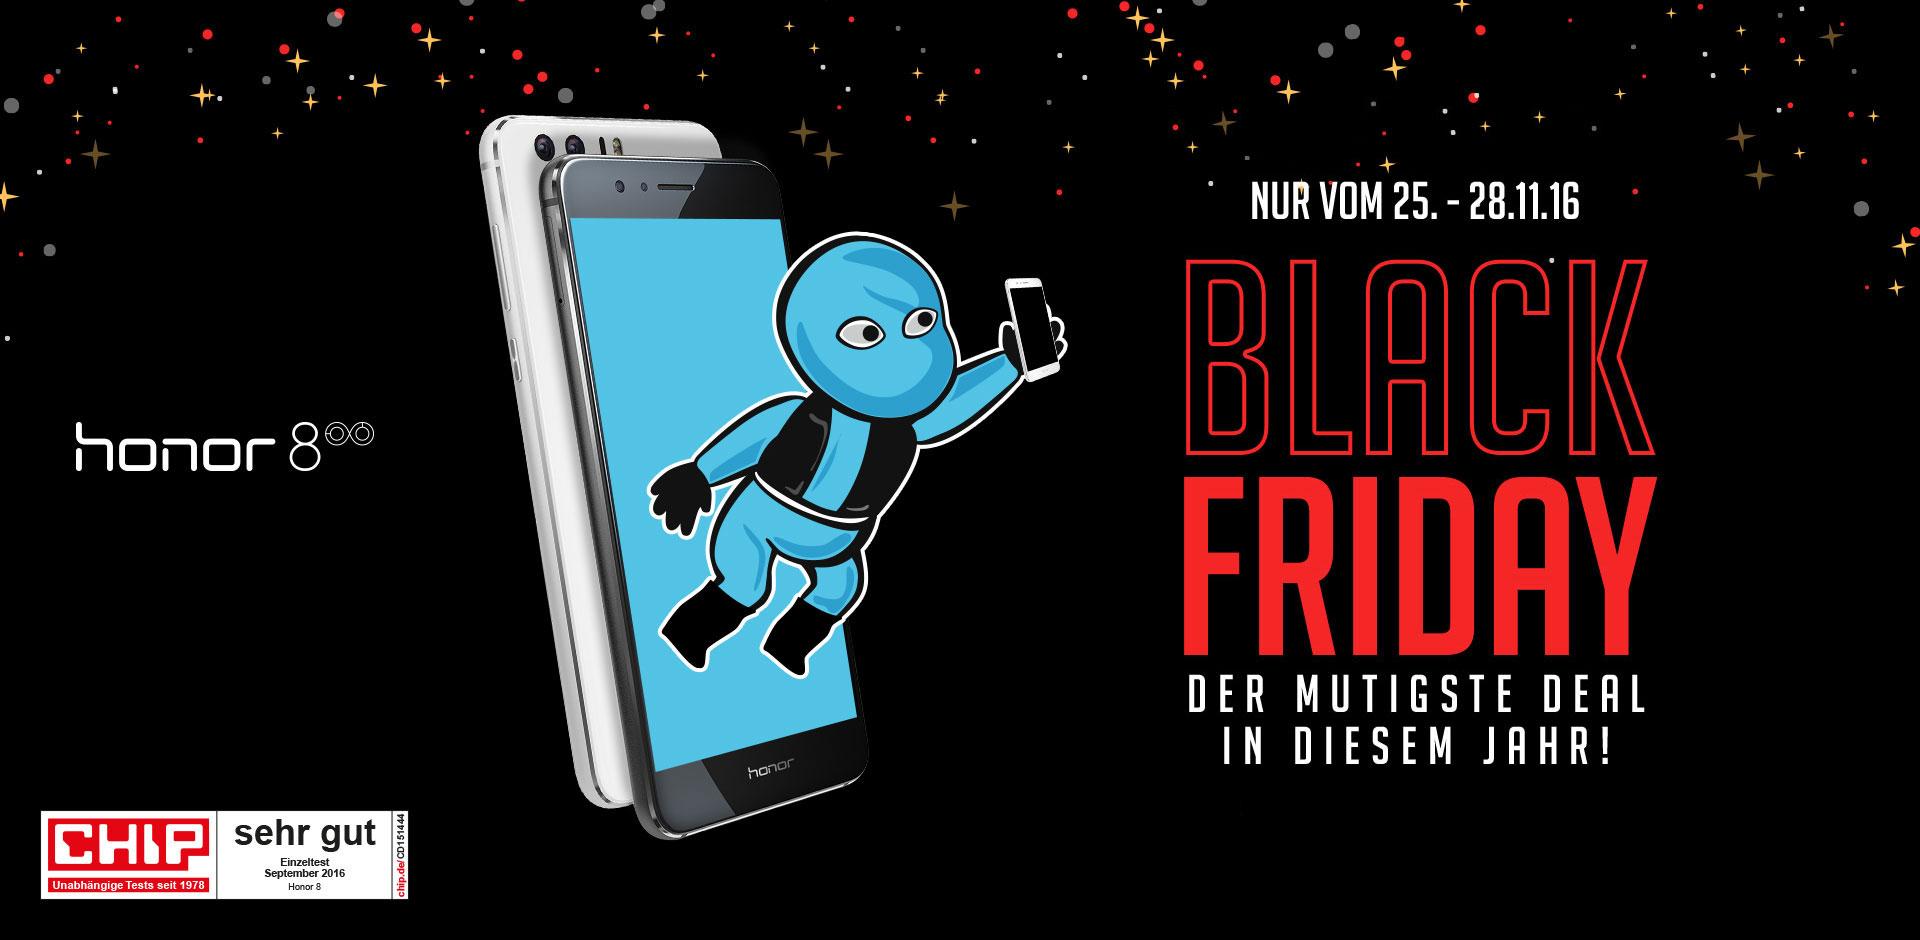 [Vmall] Honor 8 für 349€ + 50€ Cashback - Black Friday Leak